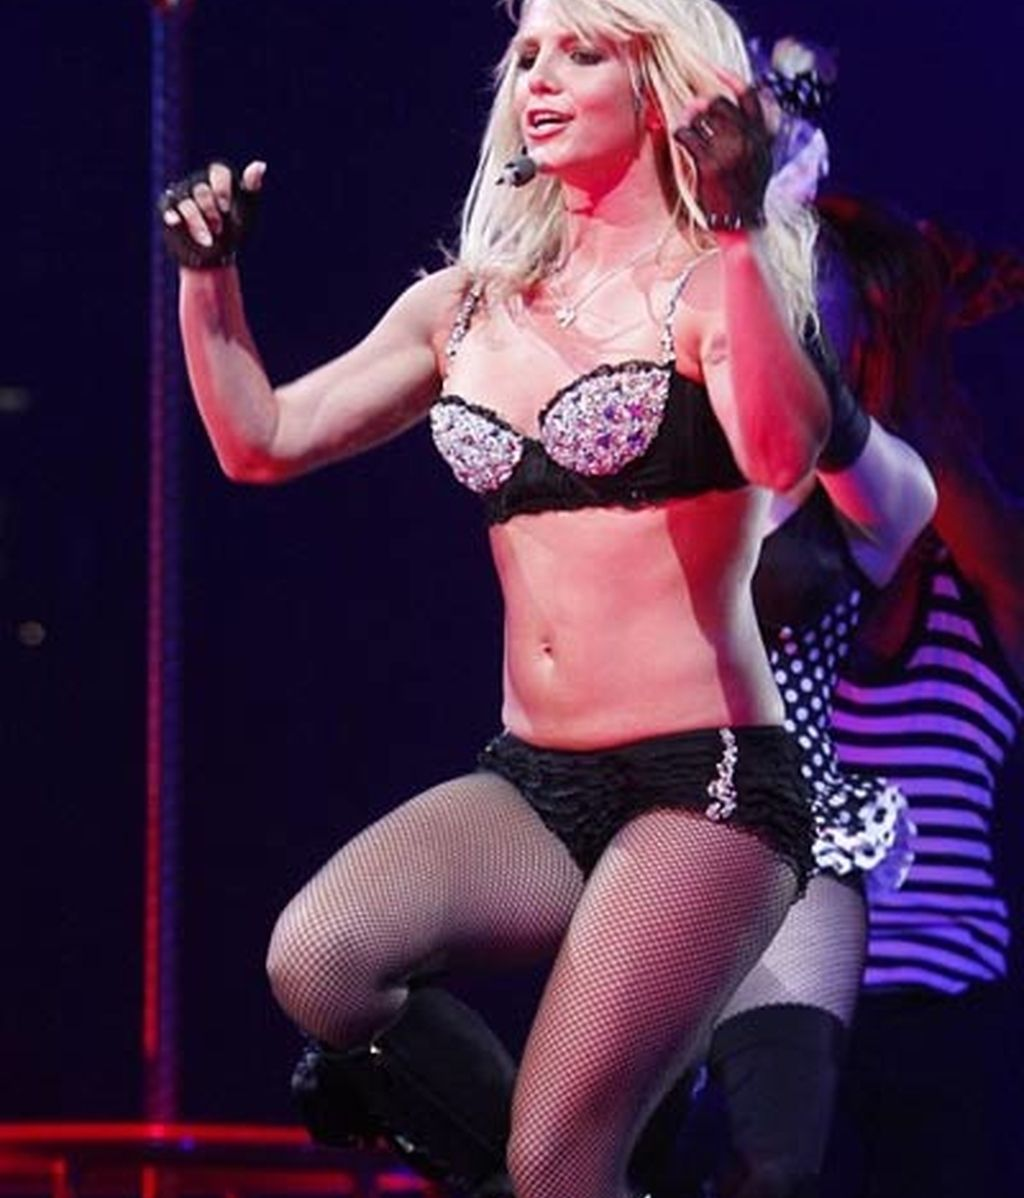 'Circus' de Britney Spears